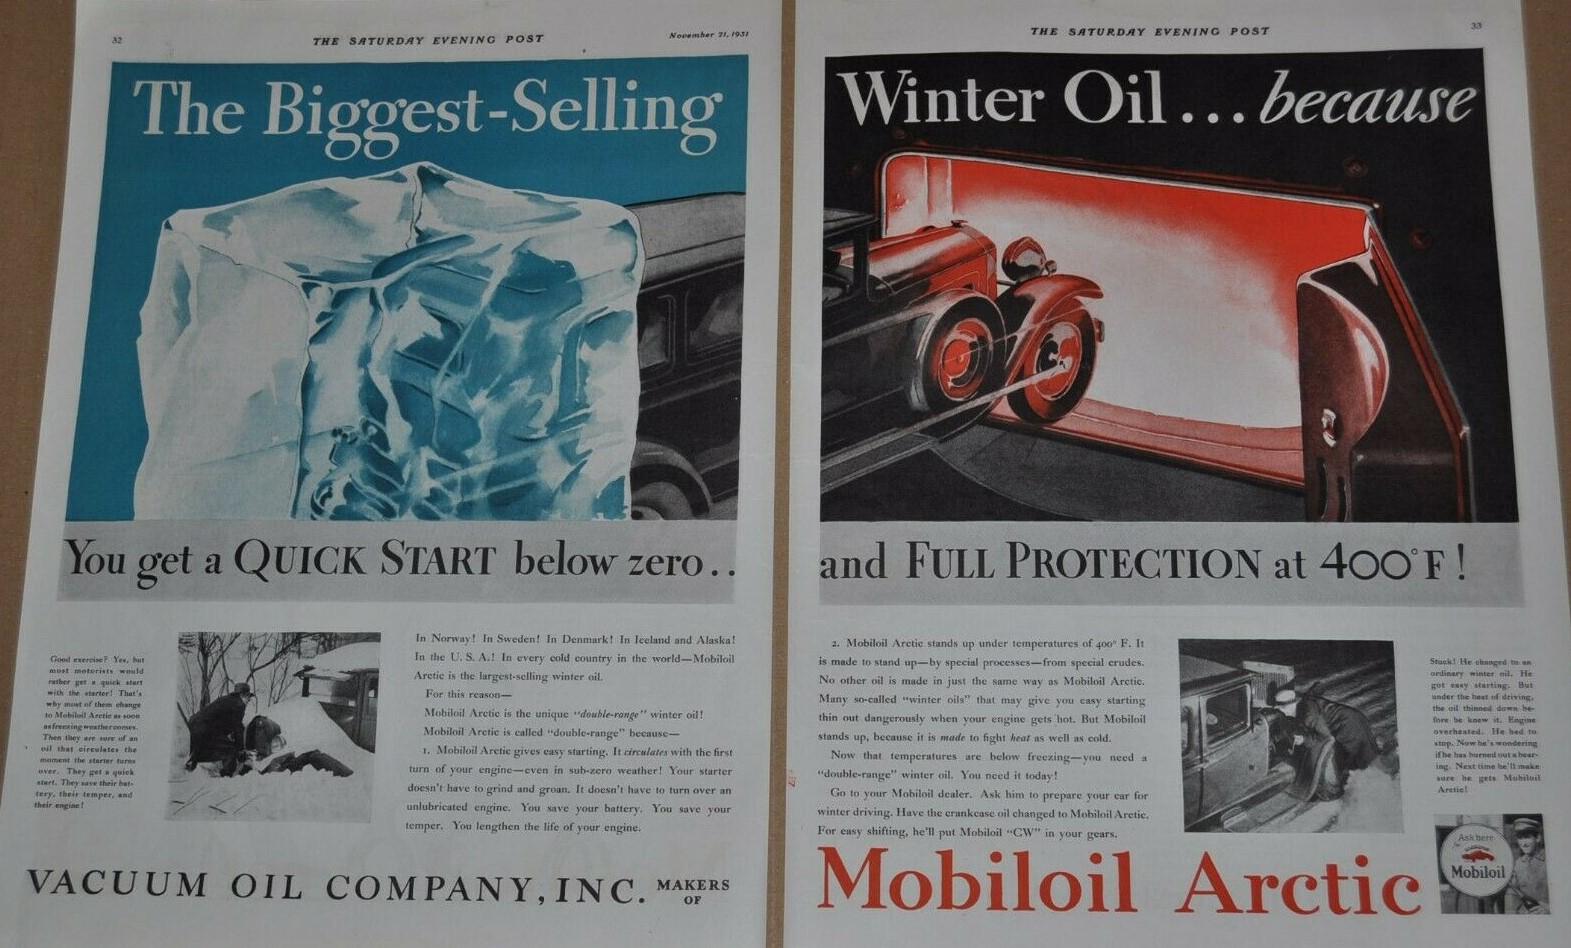 1931 MOBILOIL ARCTIC OIL